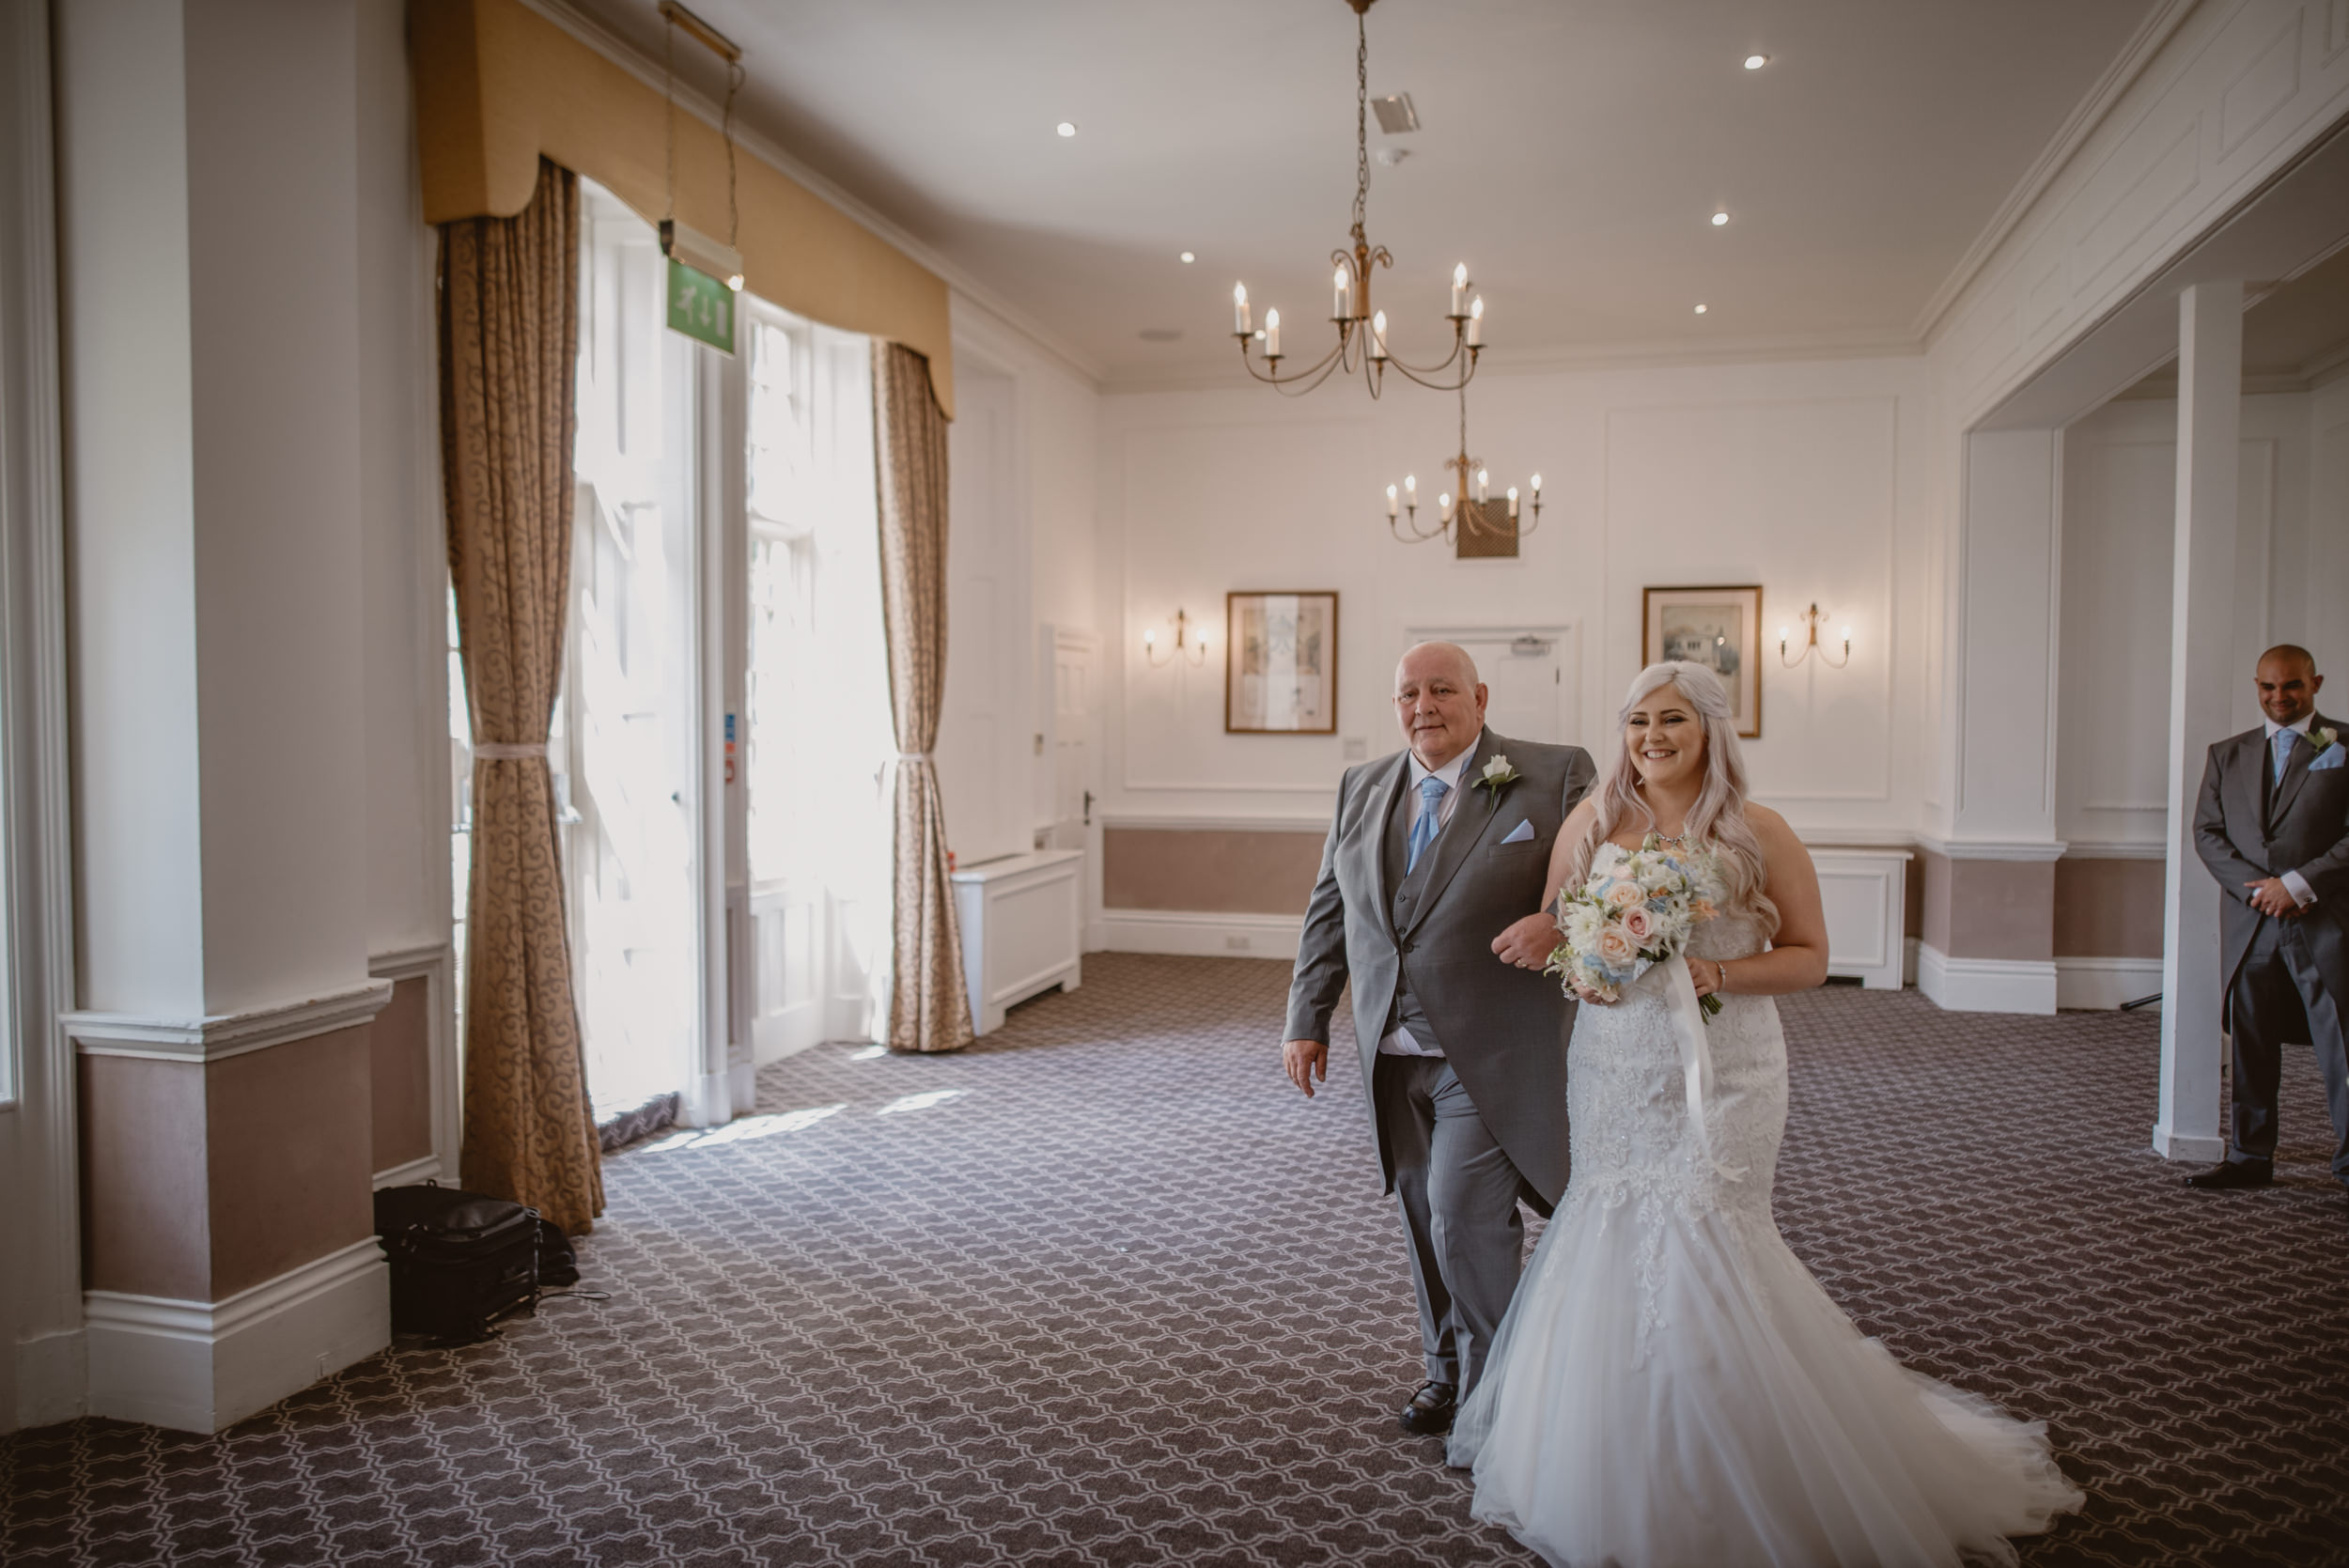 Rachel-and-James-Wedding-Horsley-Towers-State-Manu-Mendoza-Wedding-Photography-215.jpg